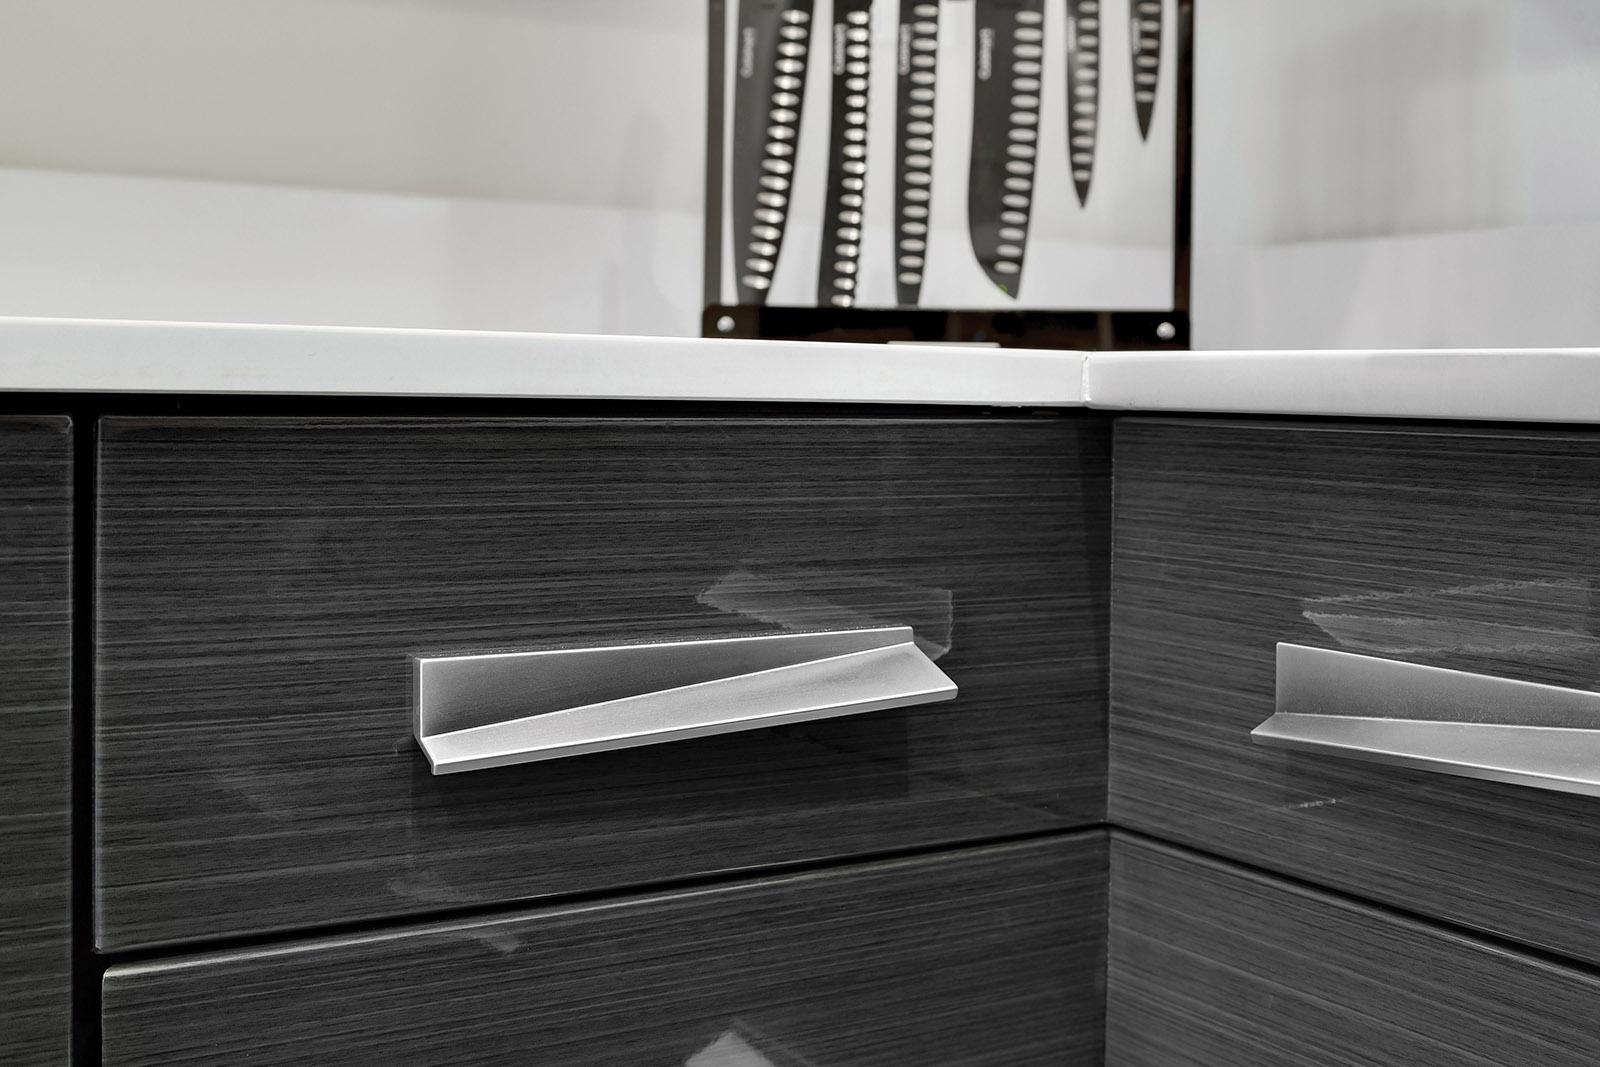 Loft Contemporary Kitchen Cabinets: Handle Closeup